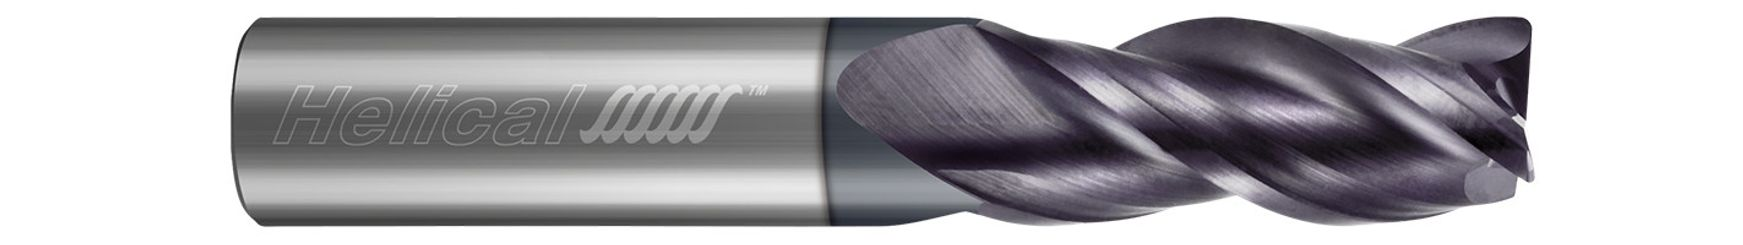 tool-details-23152